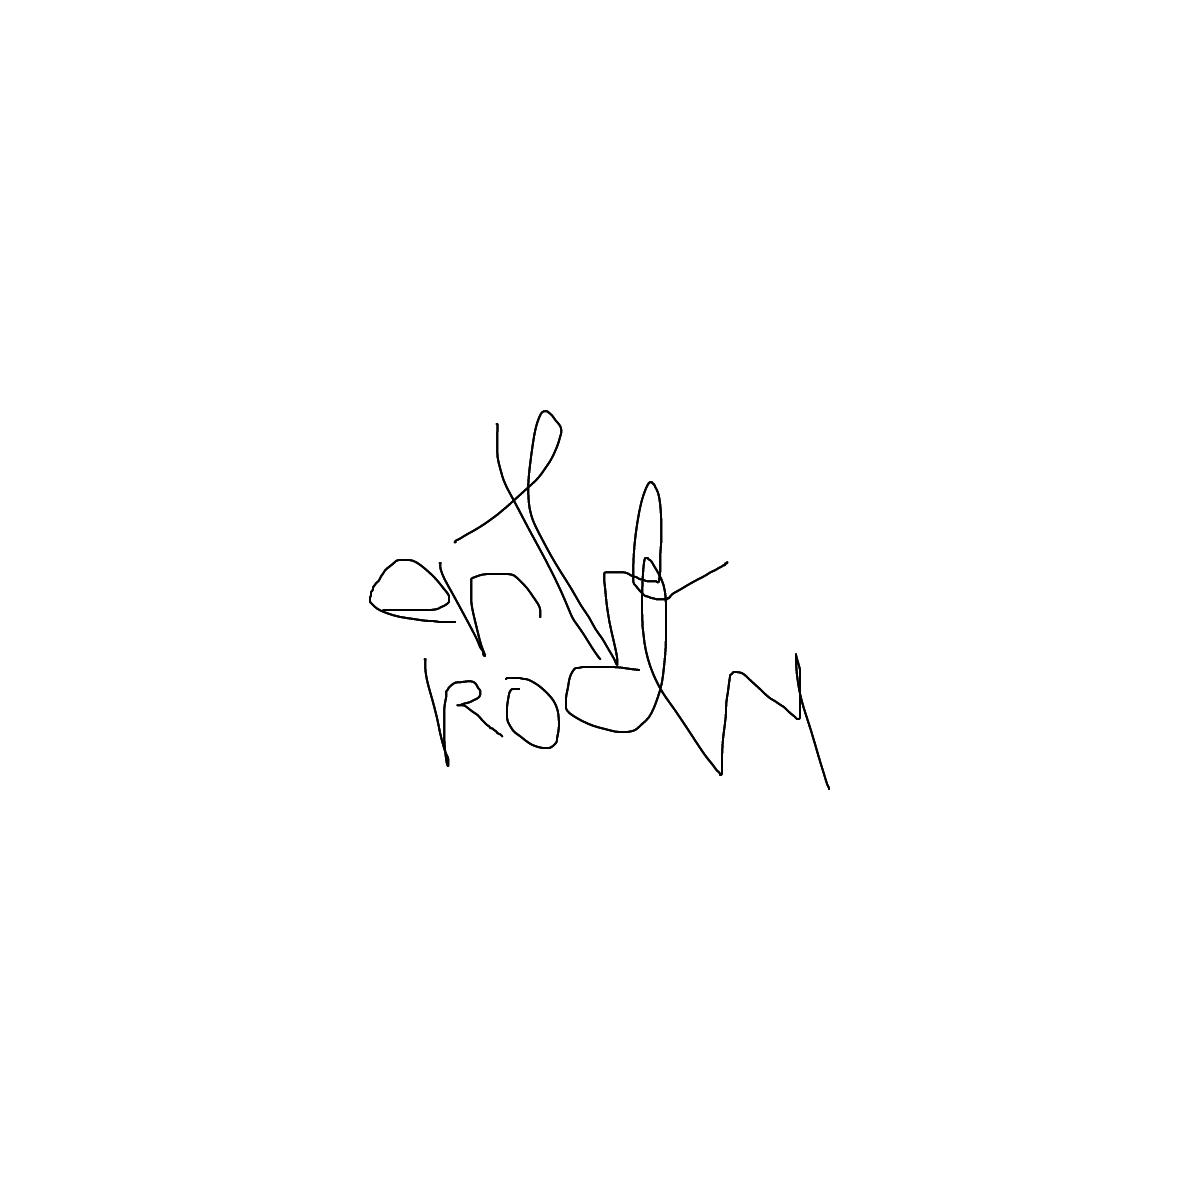 BAAAM drawing#2888 lat:9.7618465423583980lng: 76.3477630615234400